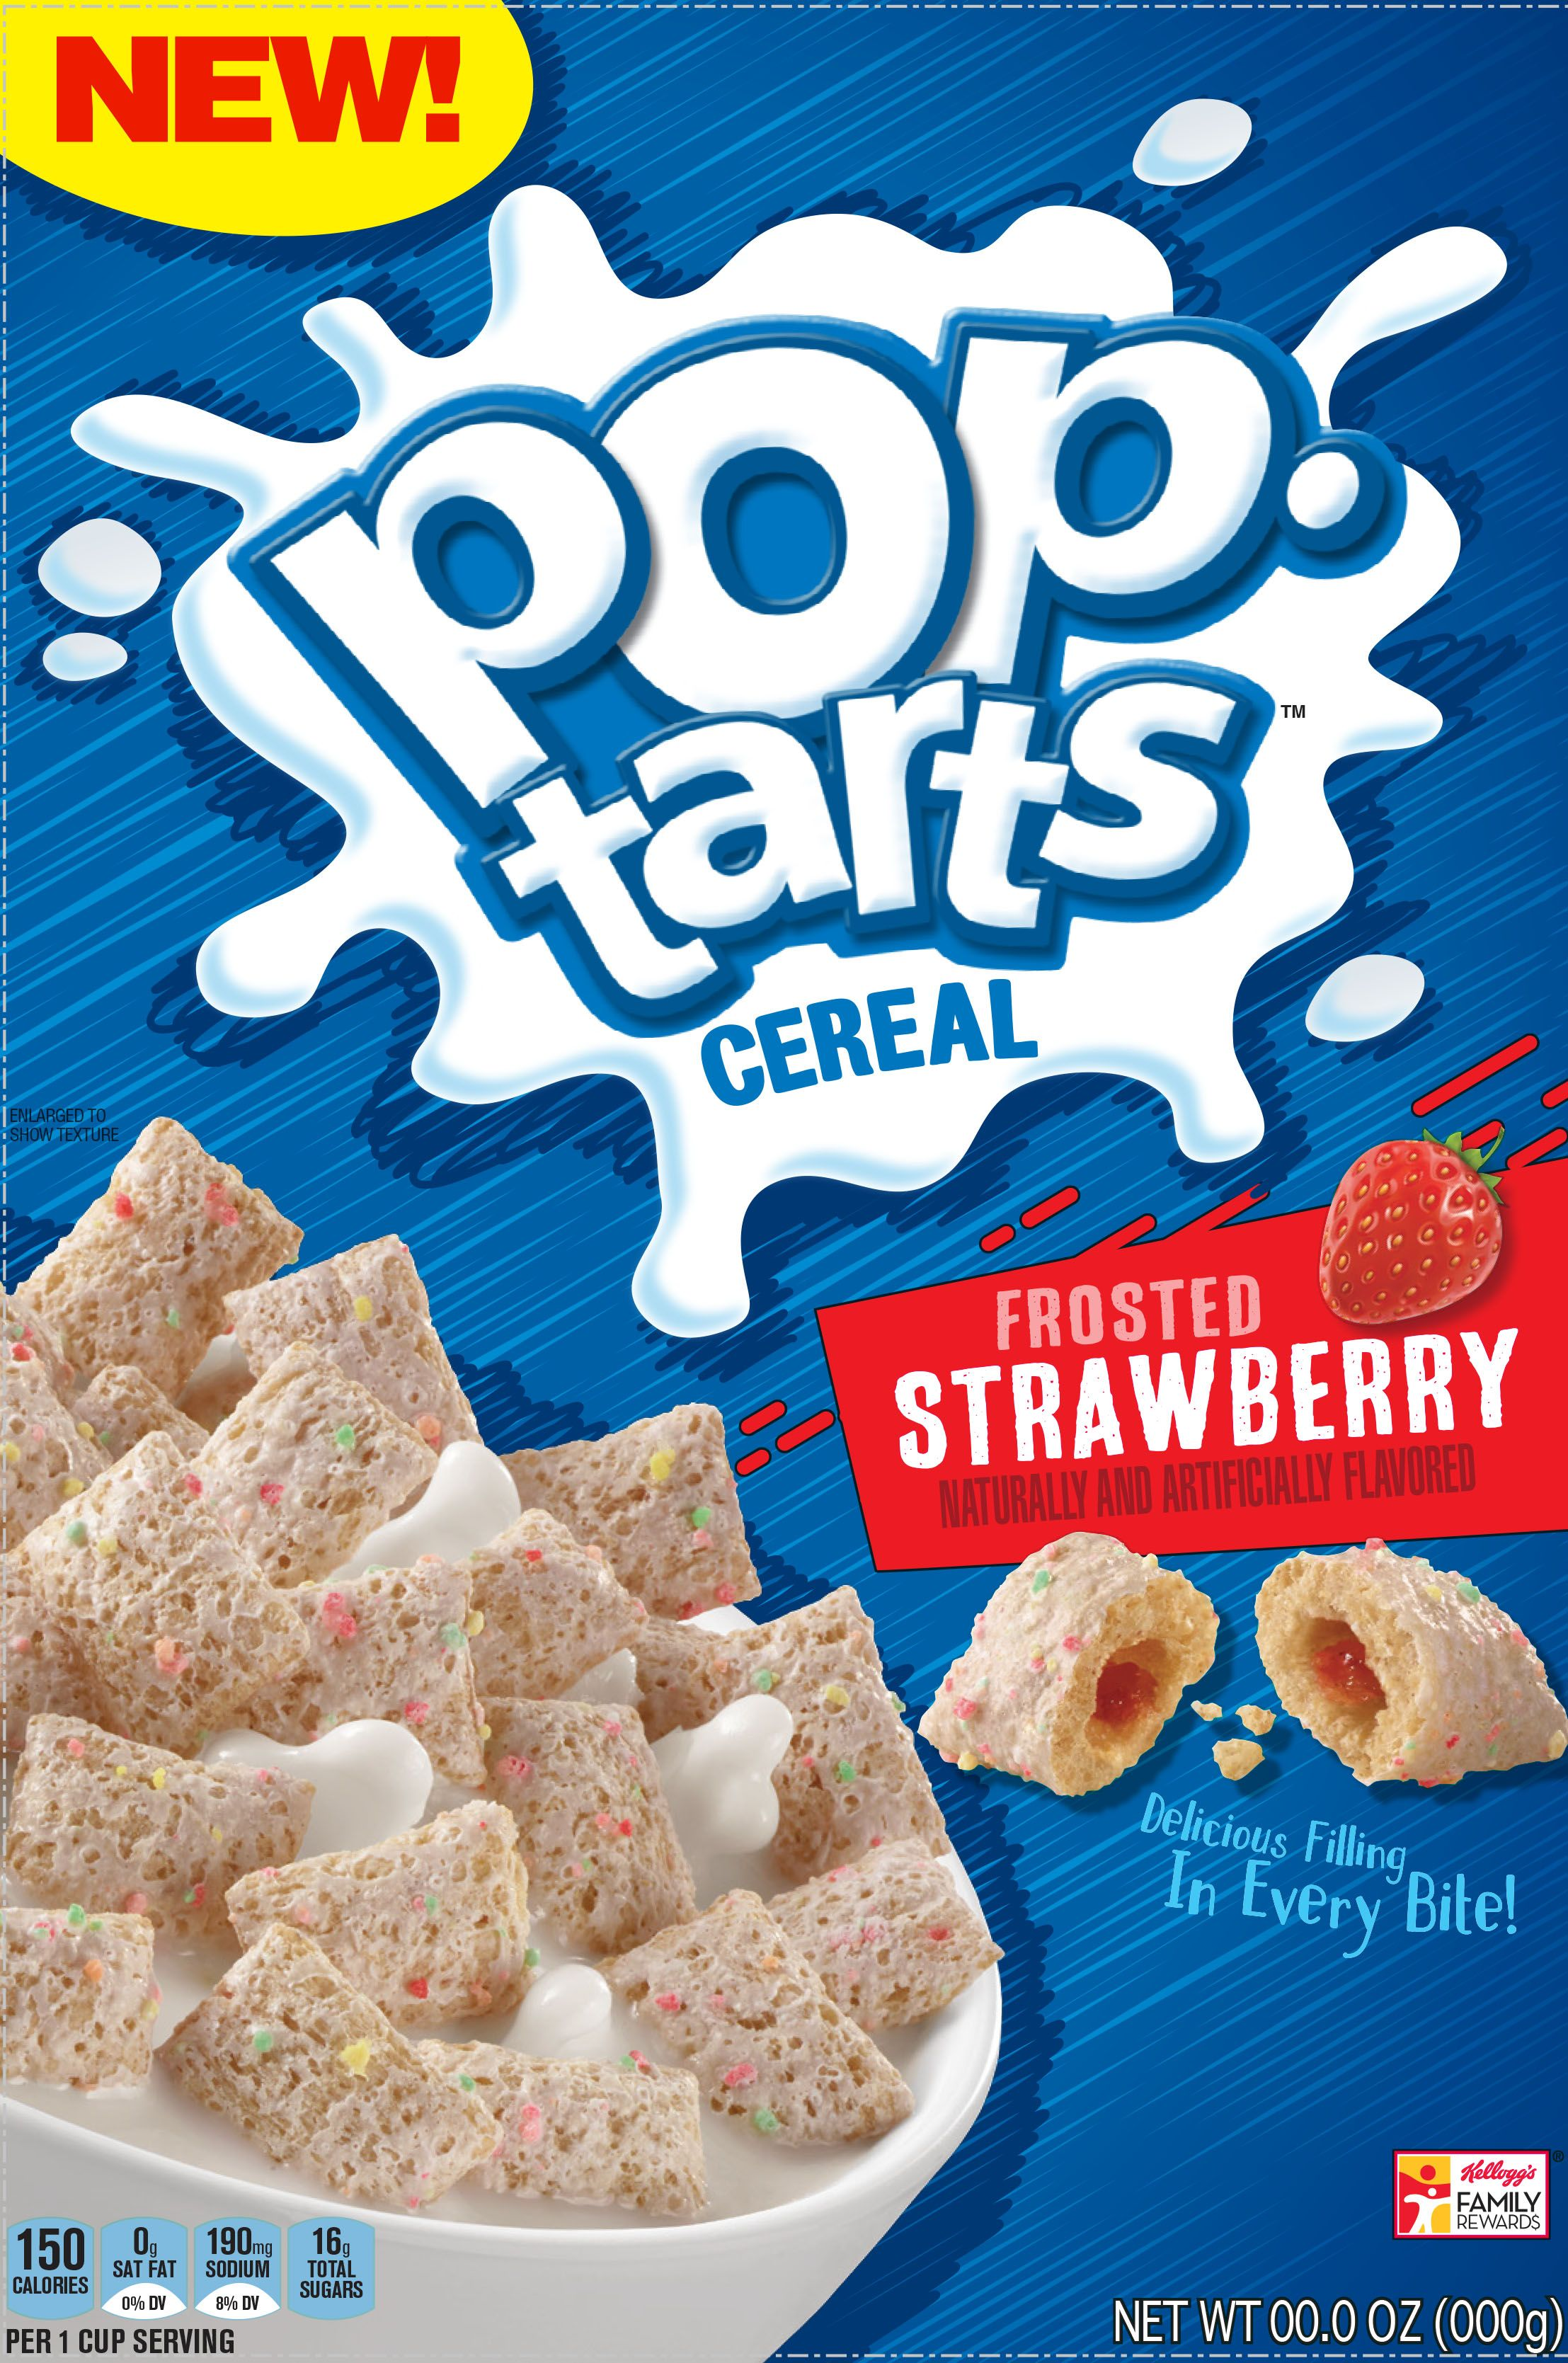 Pop-Tarts cereal